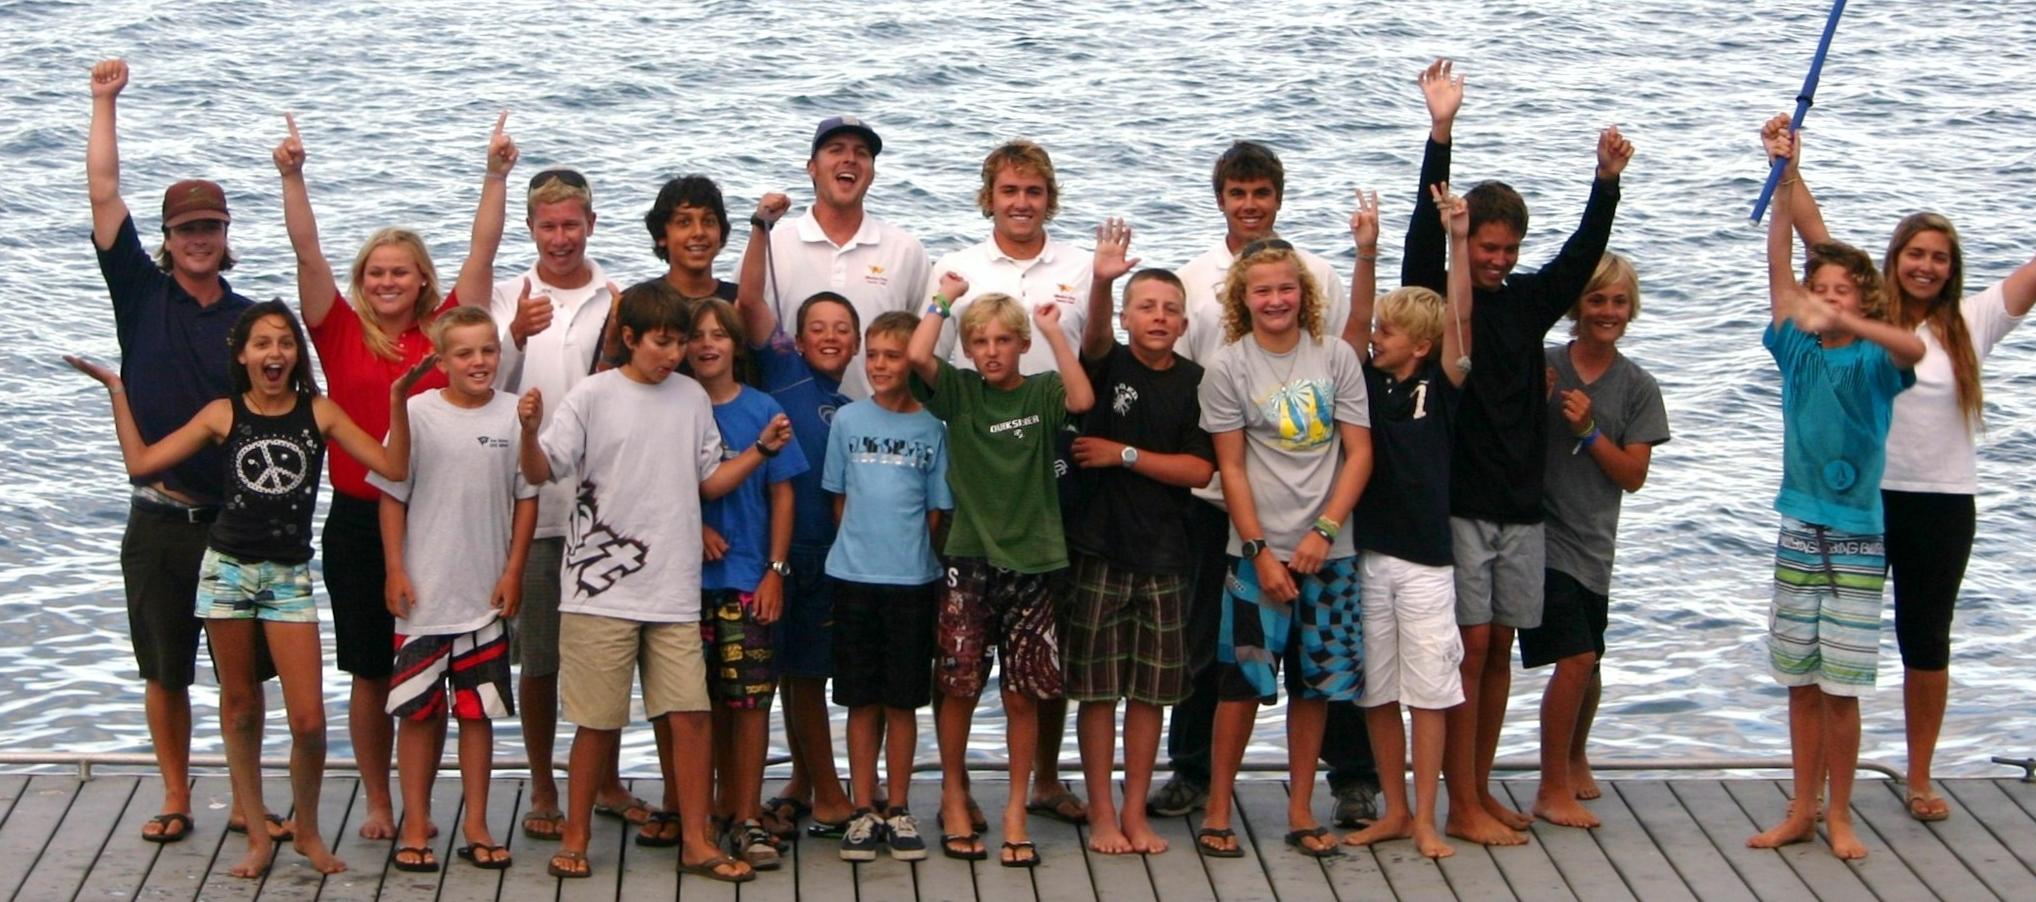 2010 Team MBYC